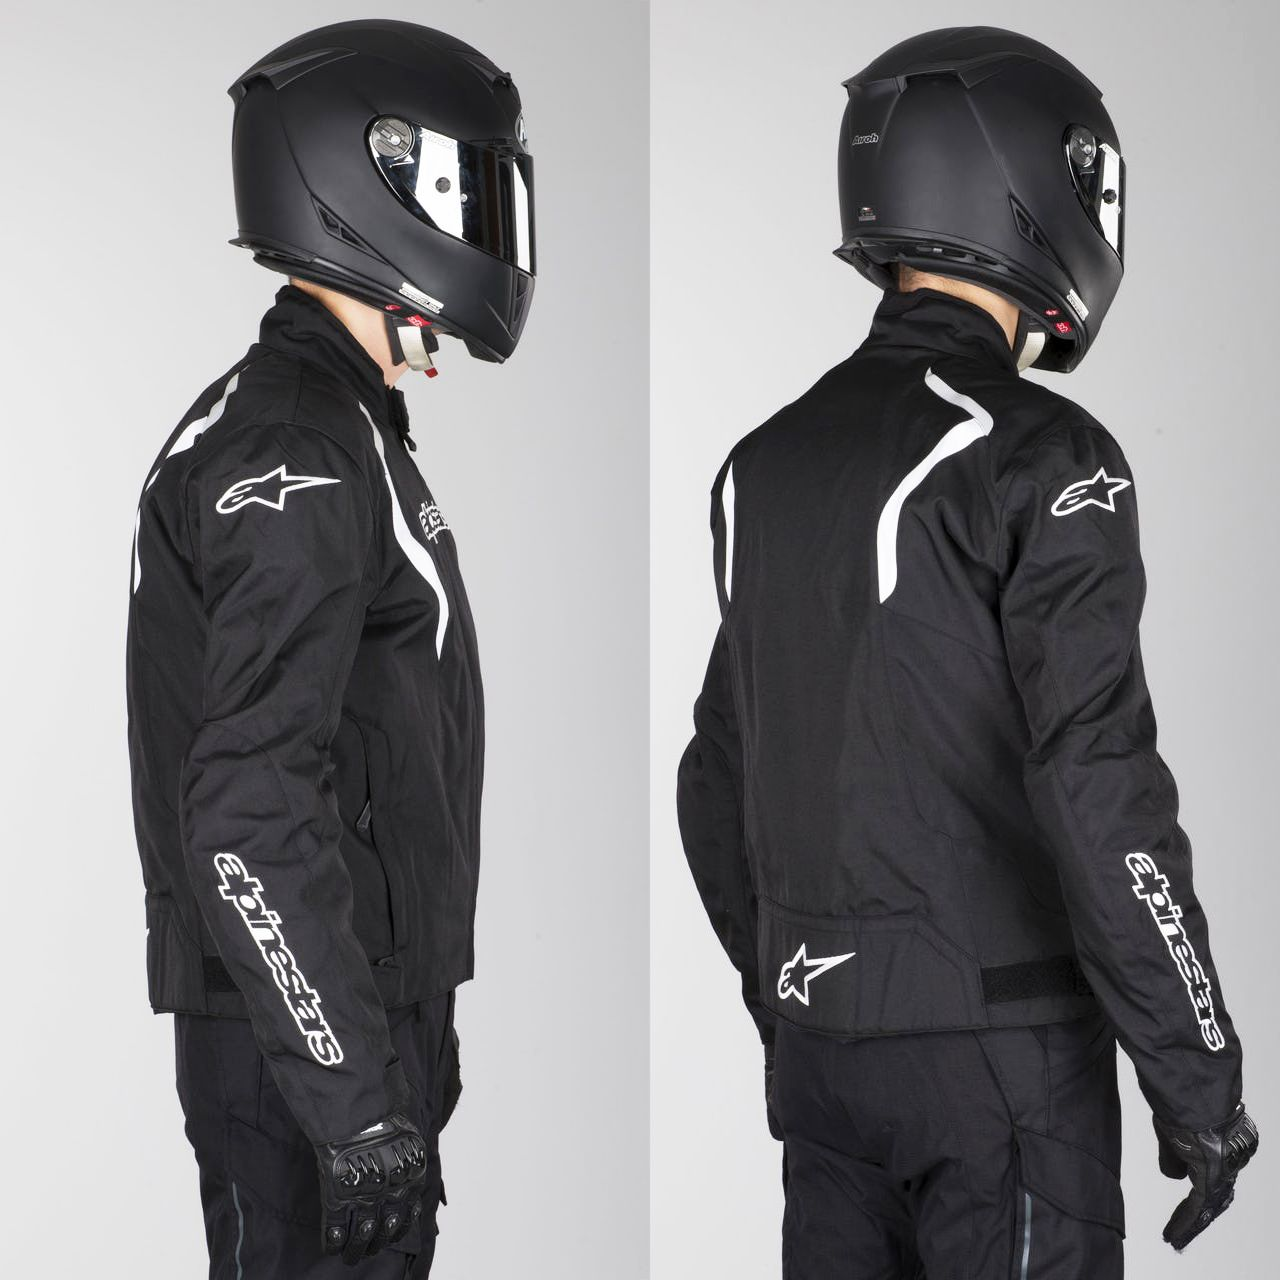 0 Jaqueta Alpinestars Fastback Impermeável (Preta/Branca)  - Planet Bike Shop Moto Acessórios